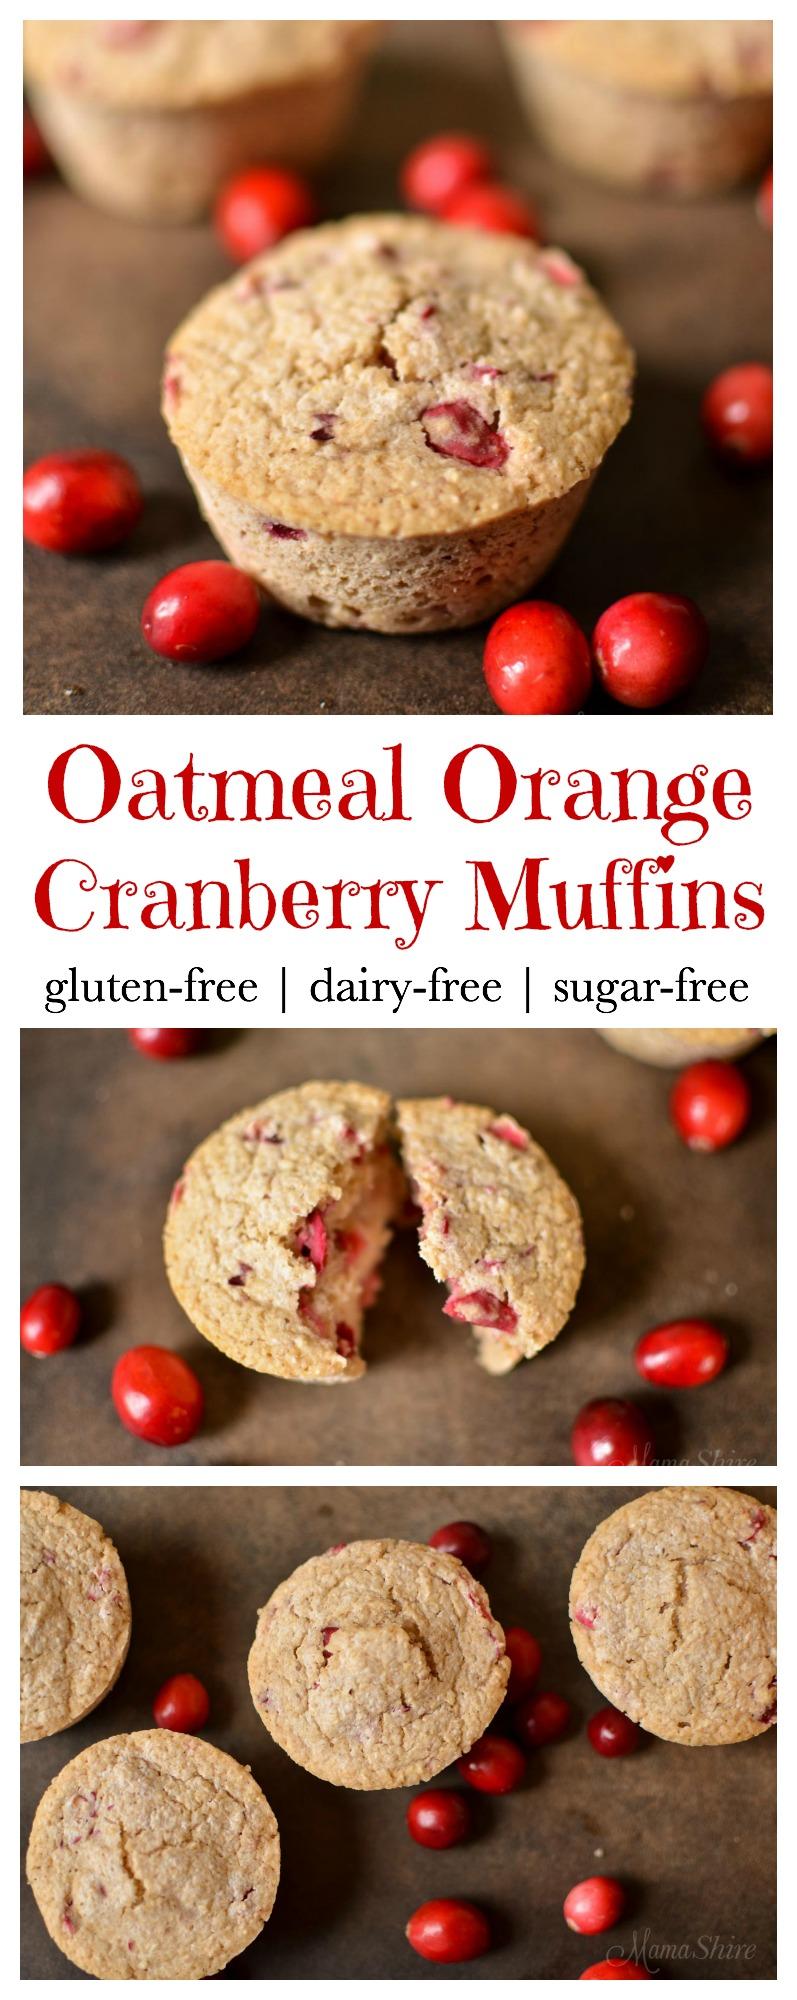 Oatmeal Orange Cranberry Muffins - Gluten-free, Dairy-free, Sugar-free